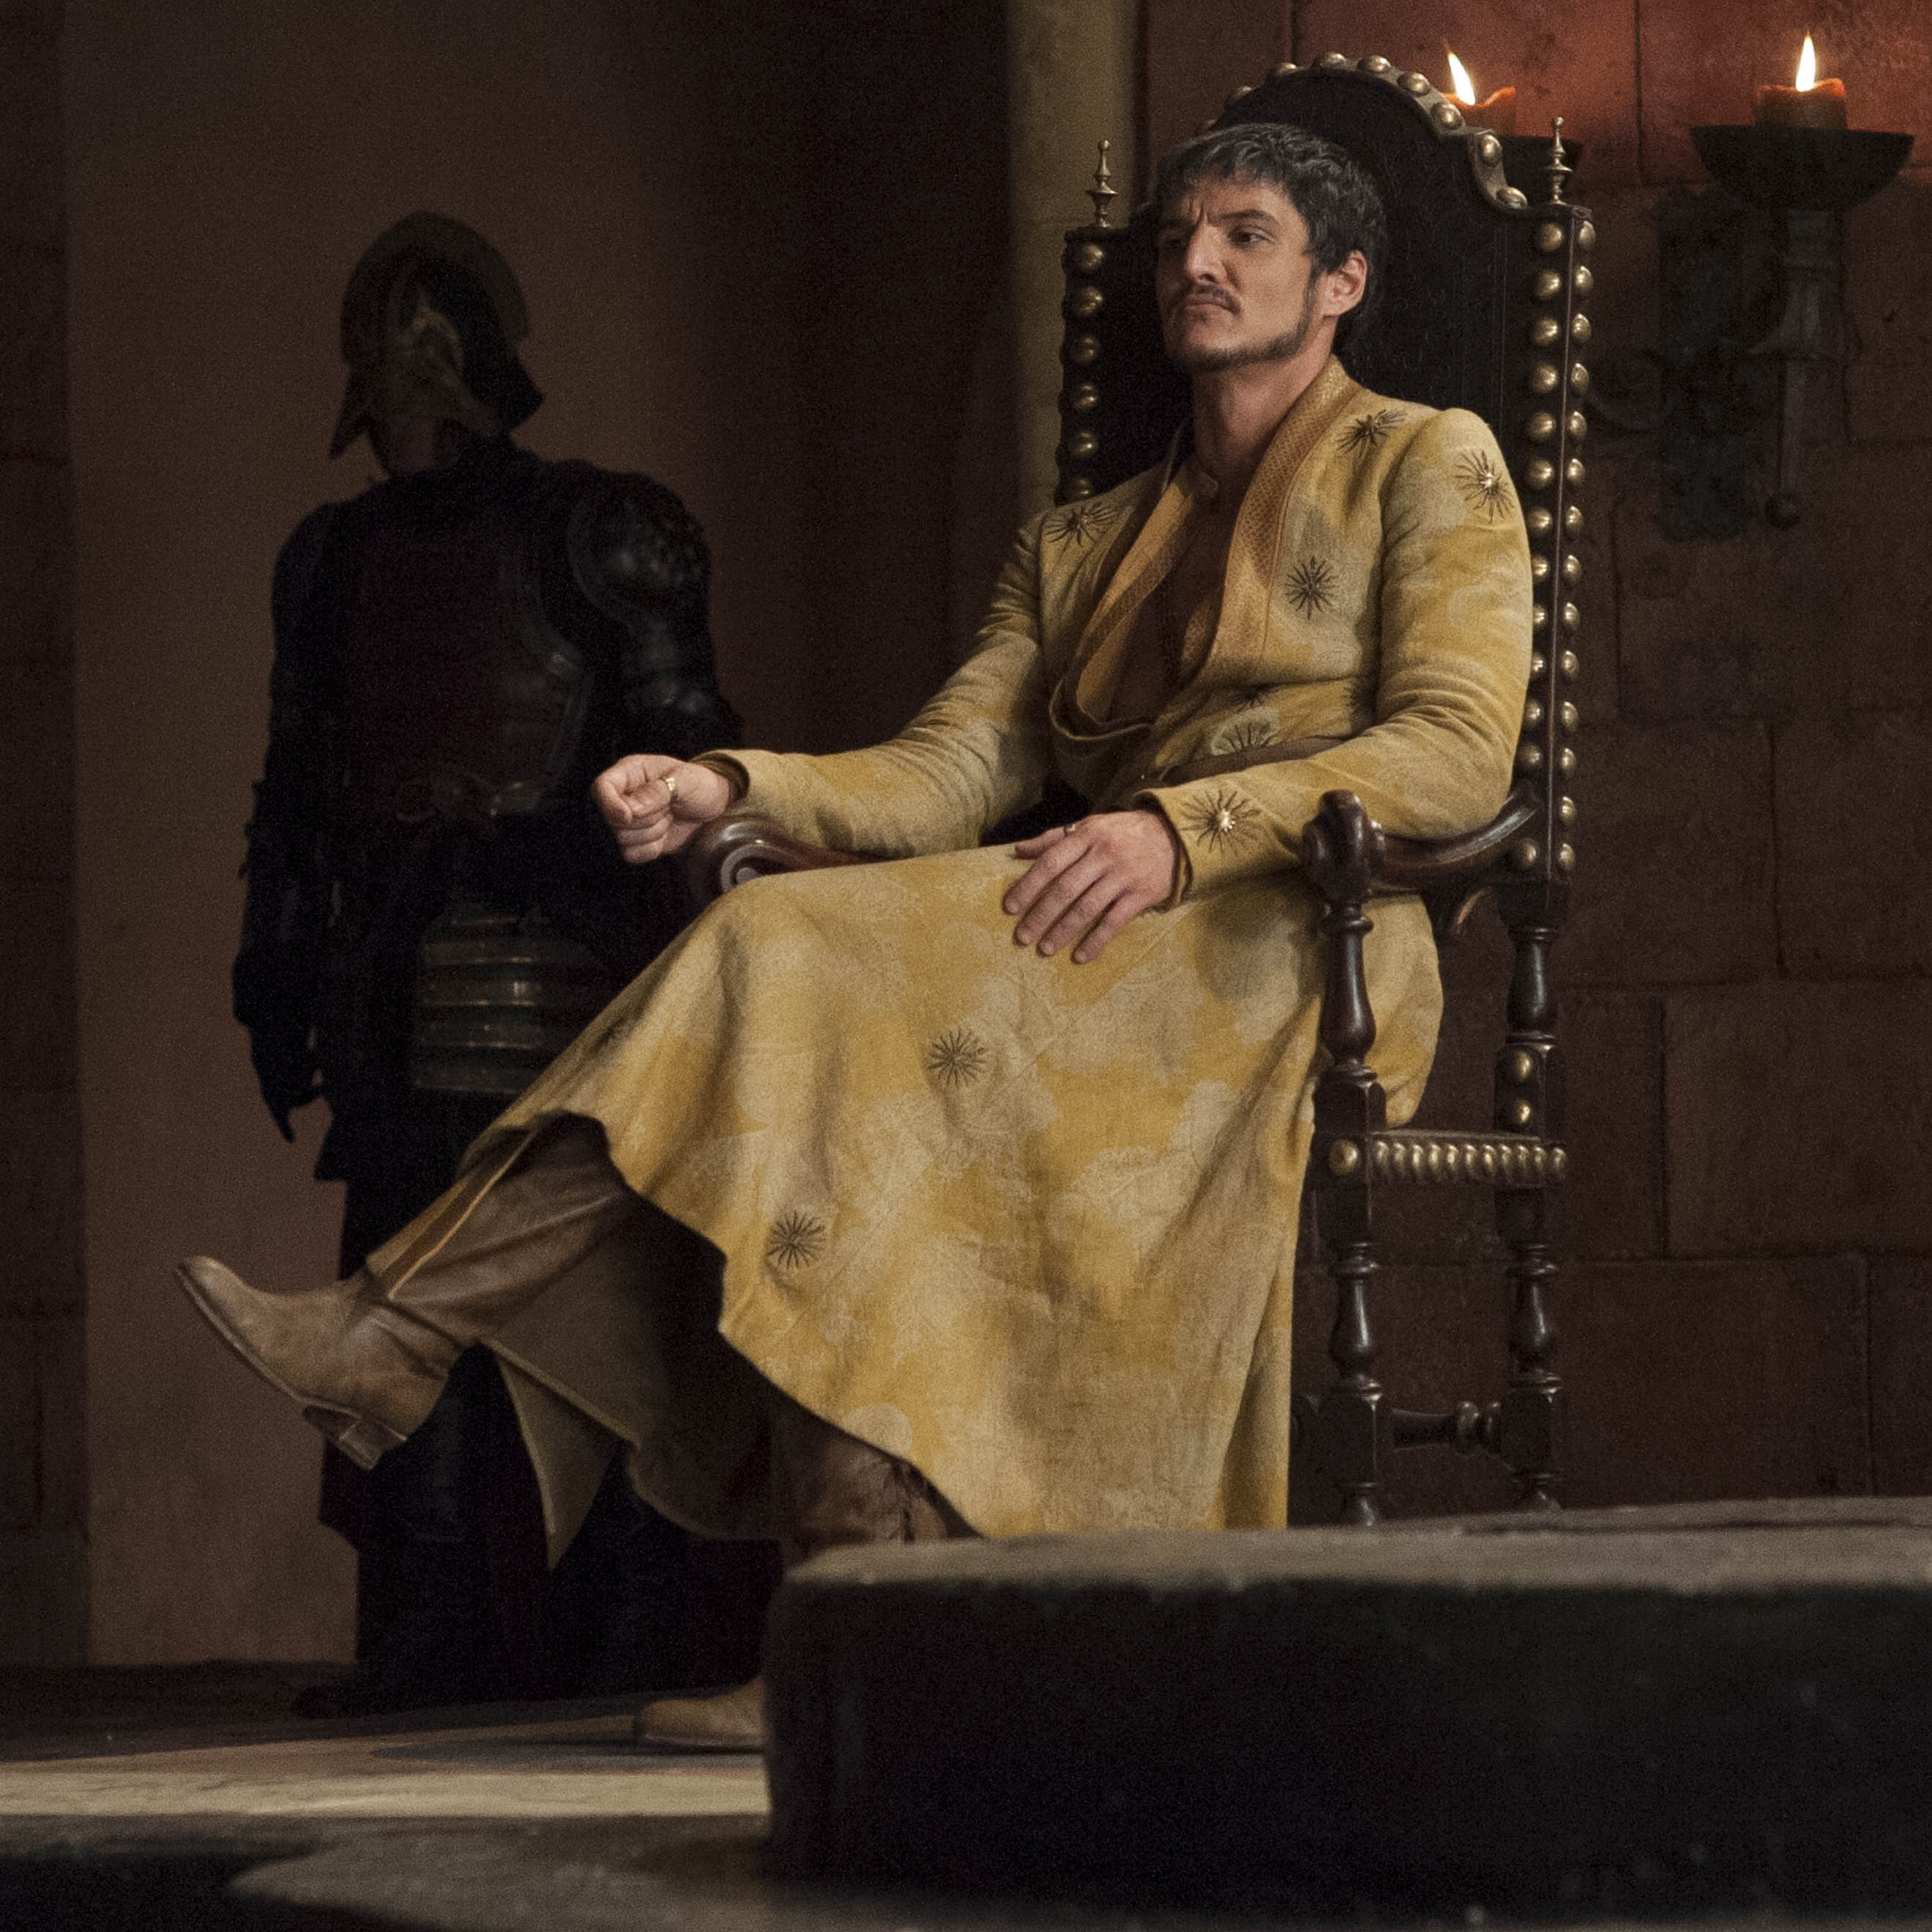 Oberyn Martell Famous Quotes | Game of Thrones Quote Daario Naharis